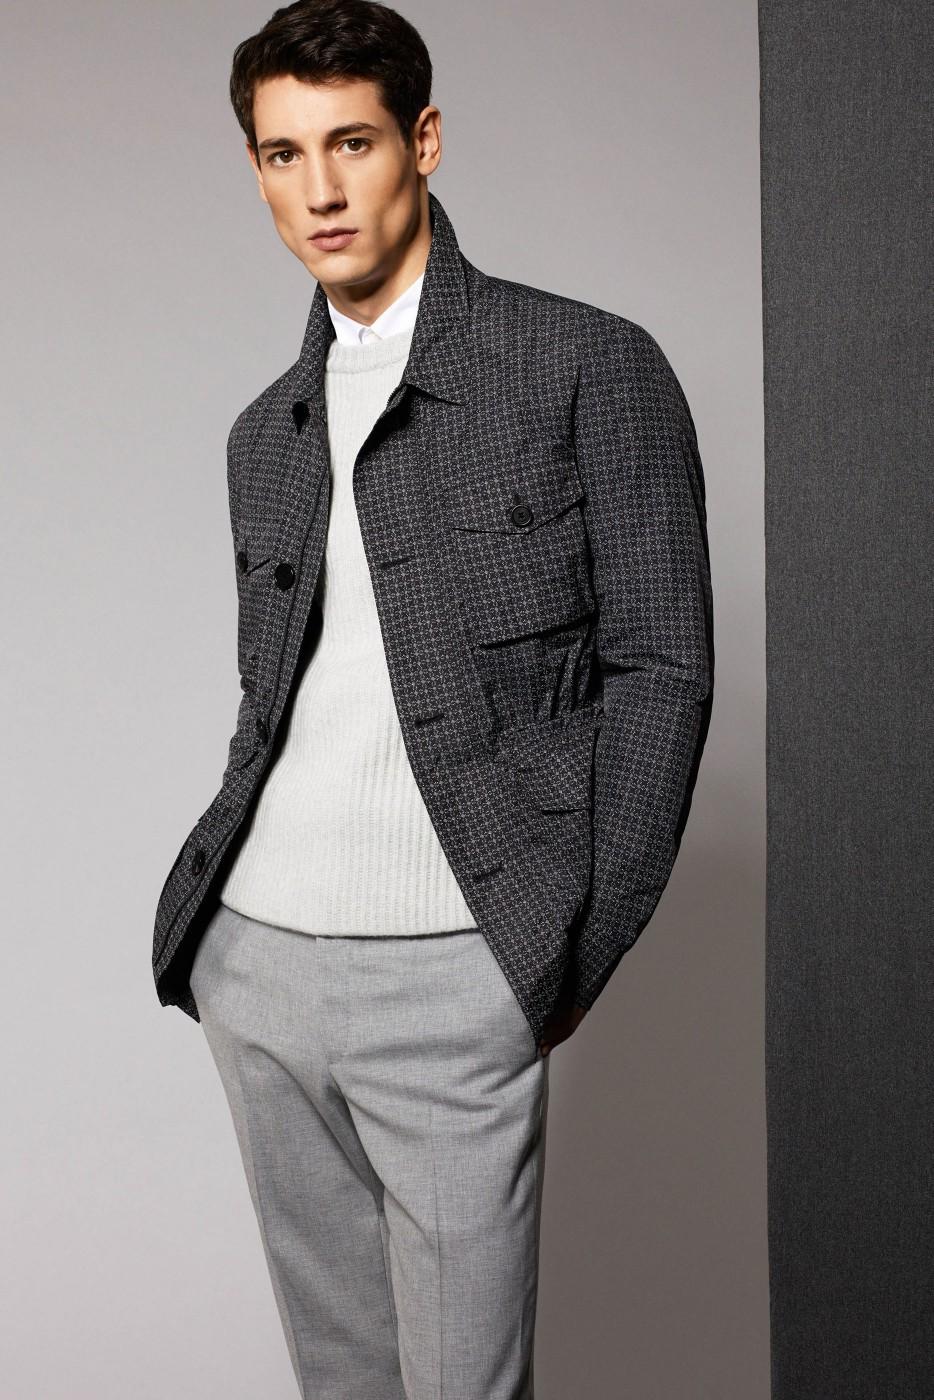 بالصور ملابس رجال , كيف اختار ملابس رجال 5211 2